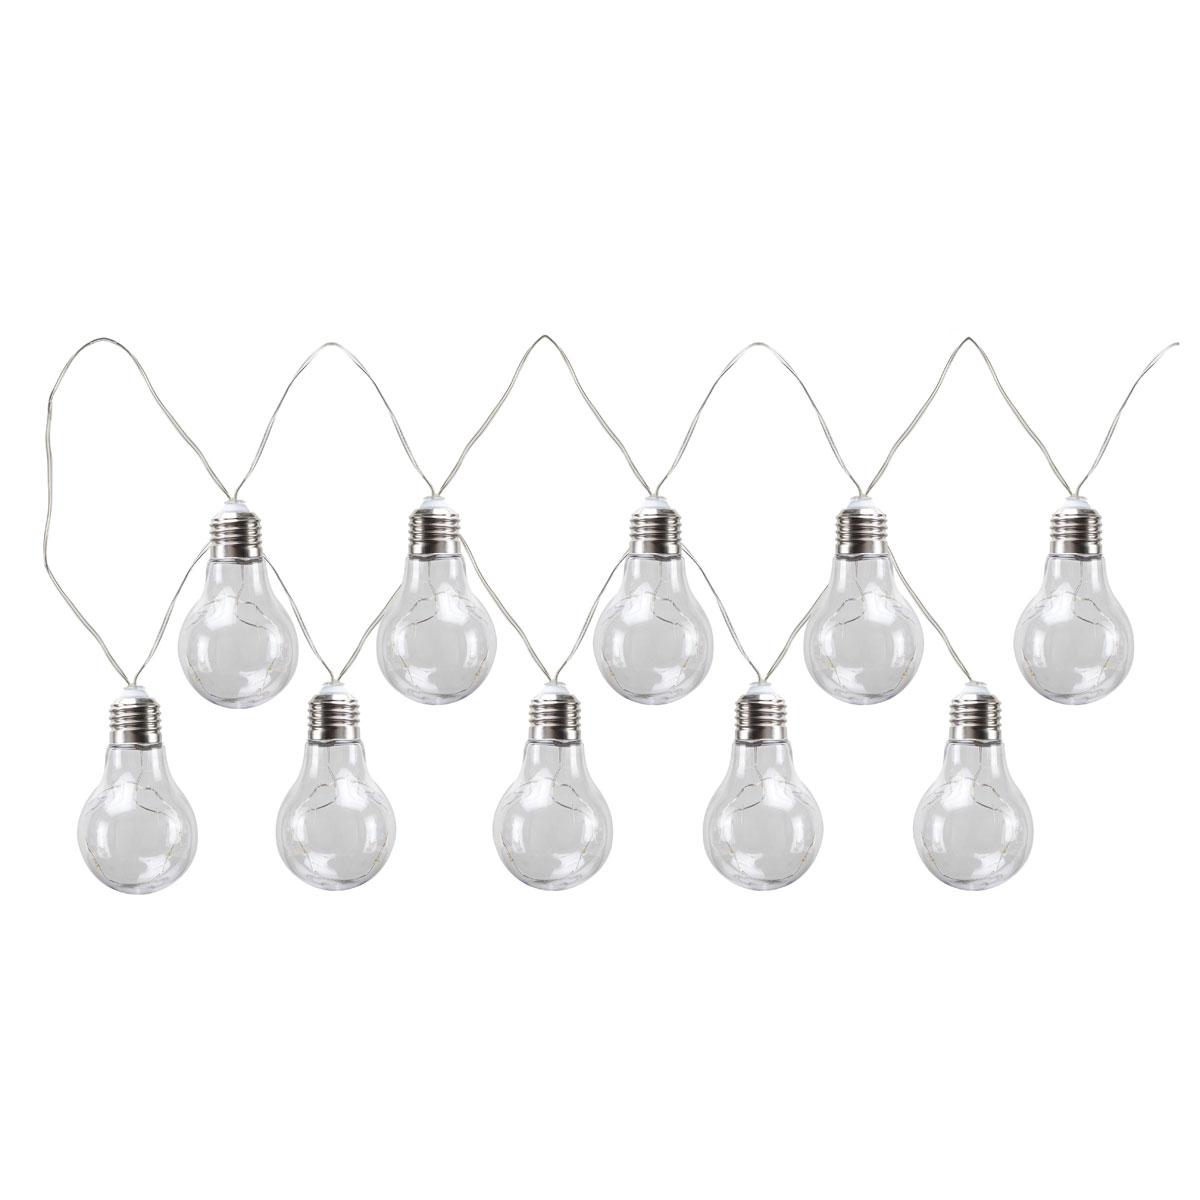 "Flector Garten LED-Solarlichterkette ""Glühbirne"""